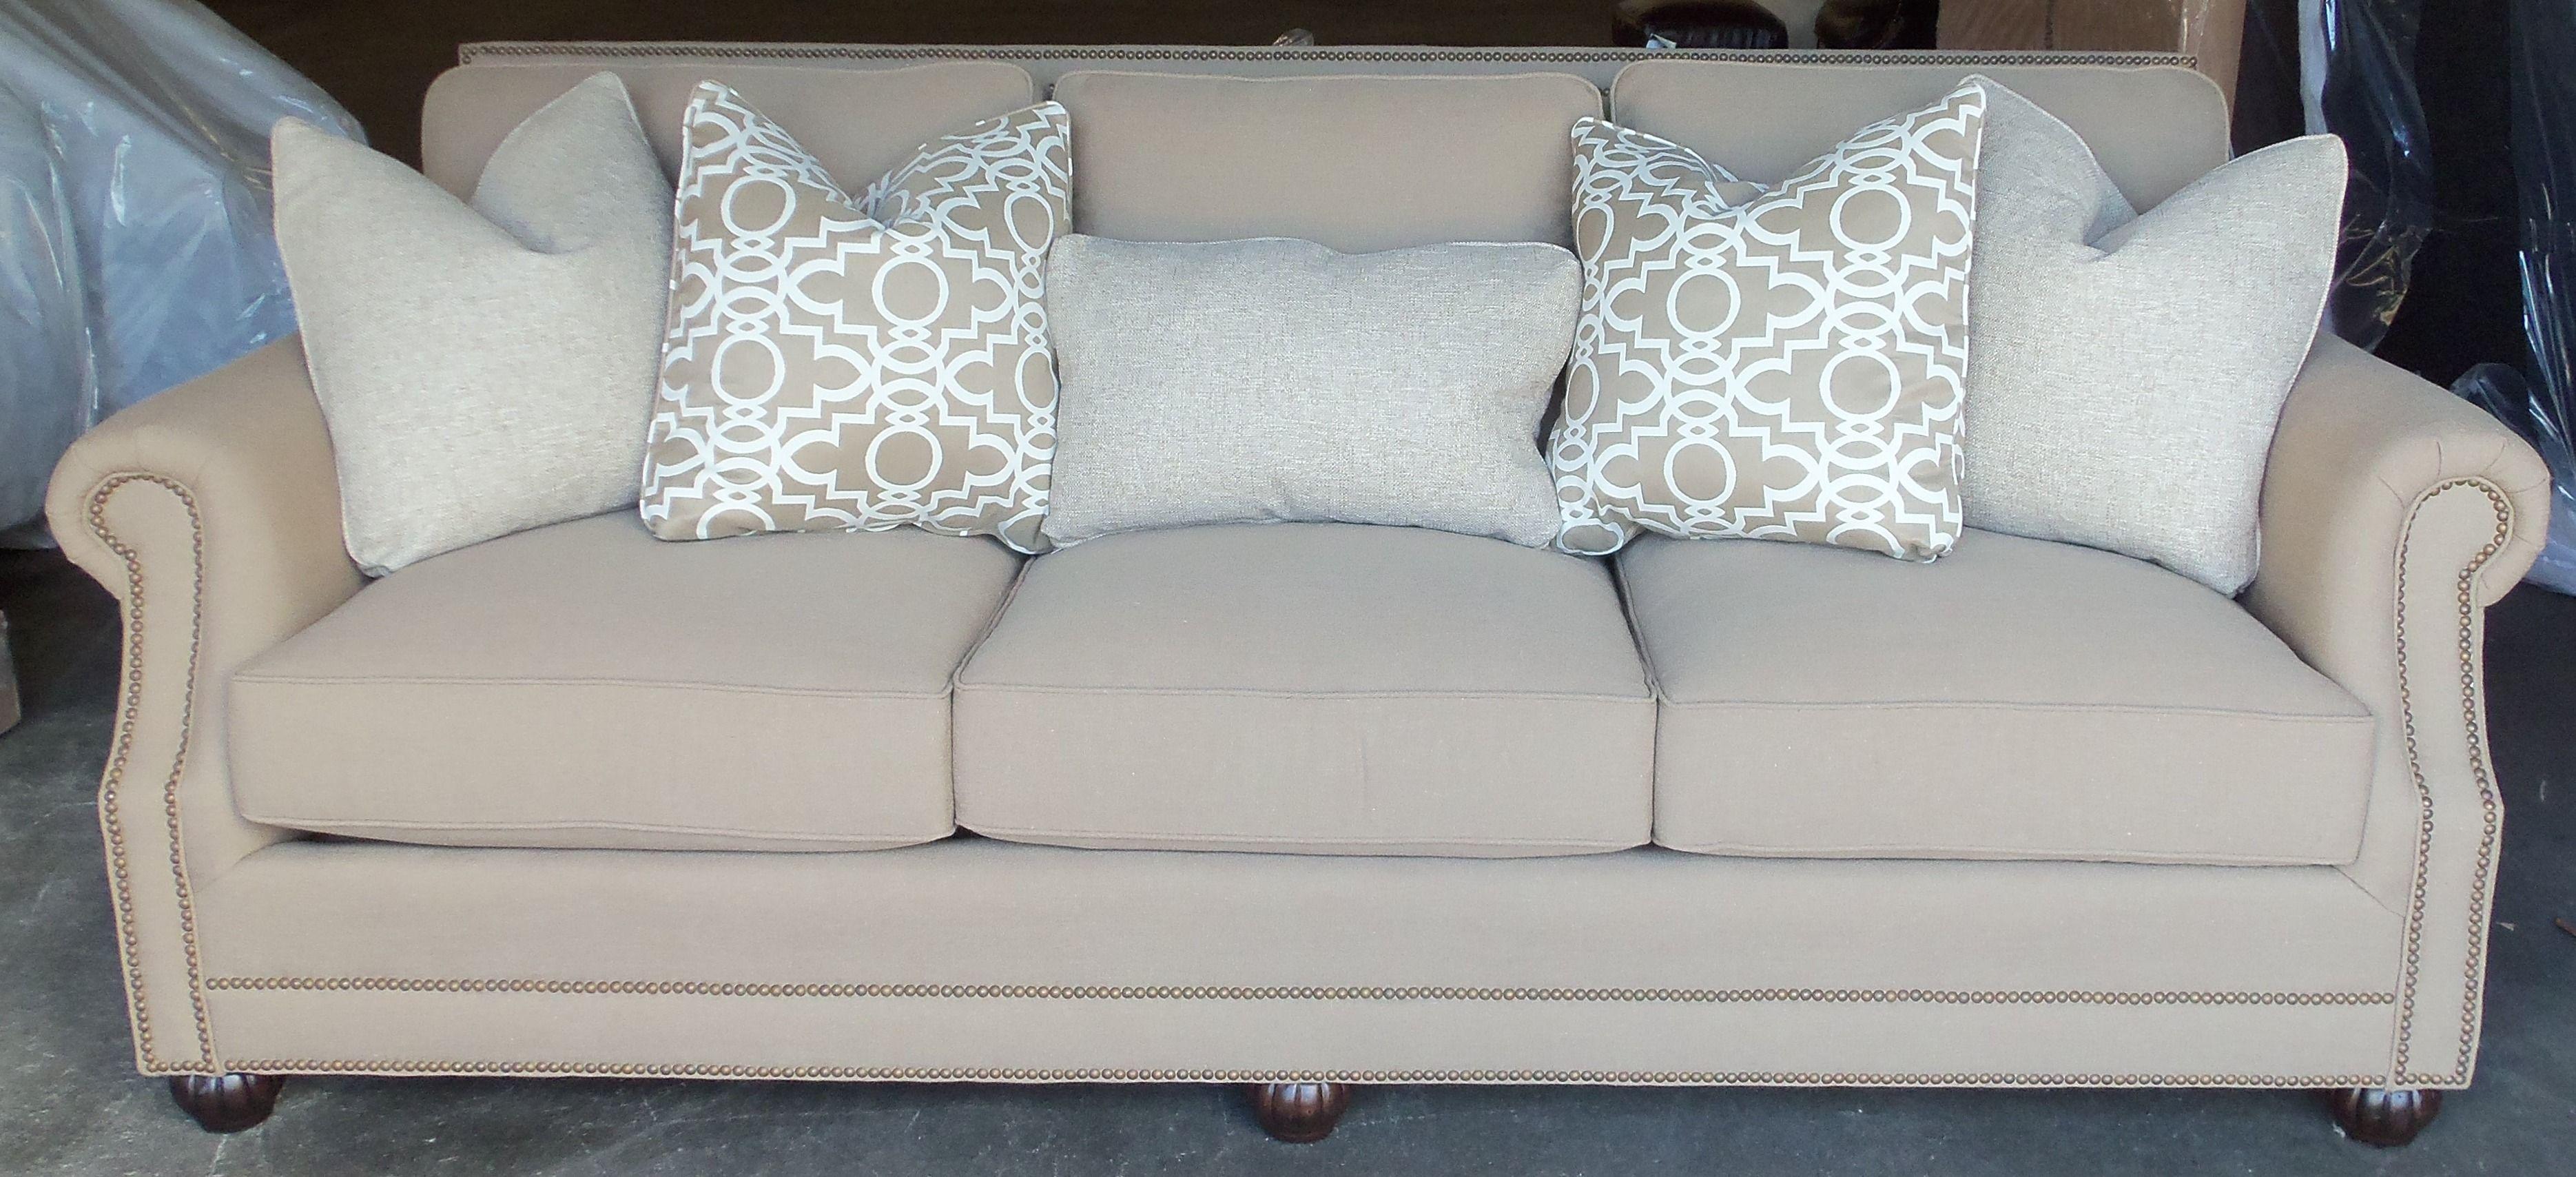 King Hickory Julianna Sofa You Choose The Fabric Or Leather Fabric Sofa Hickory Chair Sofa Price